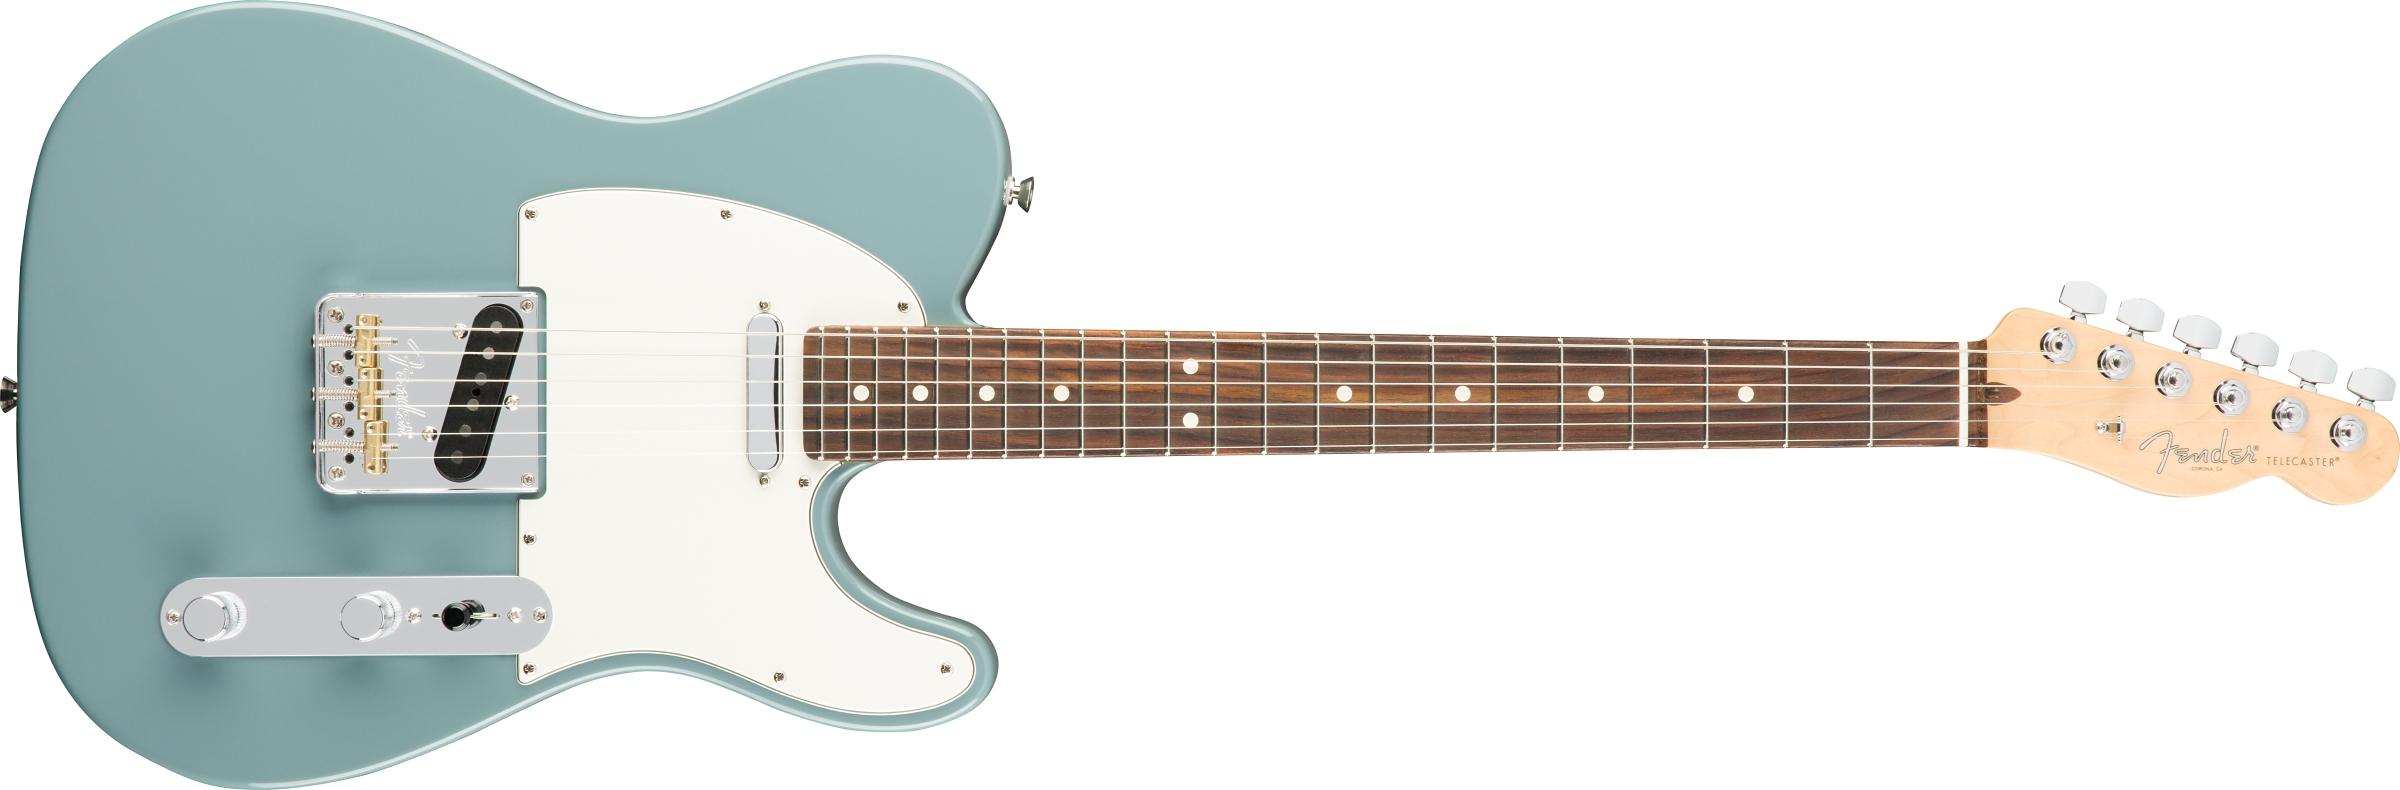 american professional telecaster electric guitars. Black Bedroom Furniture Sets. Home Design Ideas